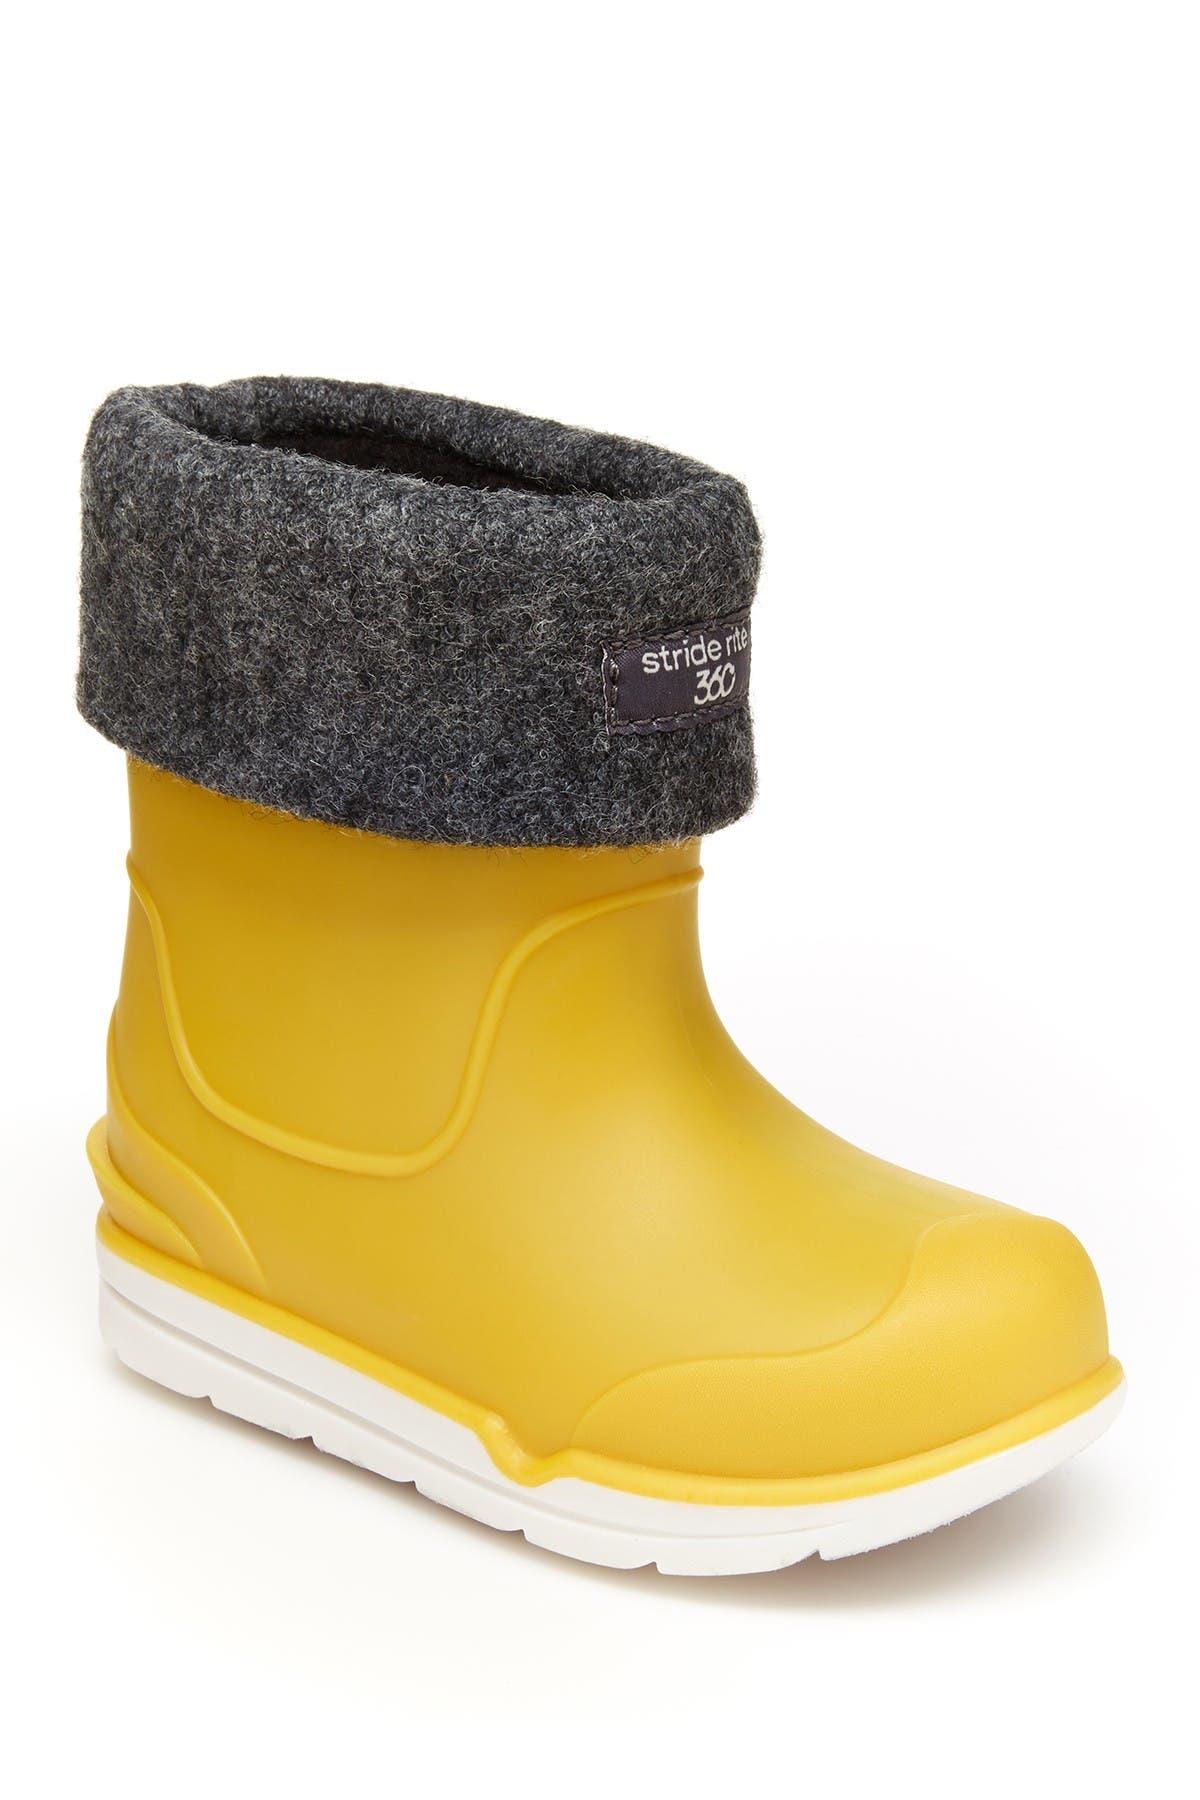 Image of Stride Rite Bellamy Faux Fur Boot